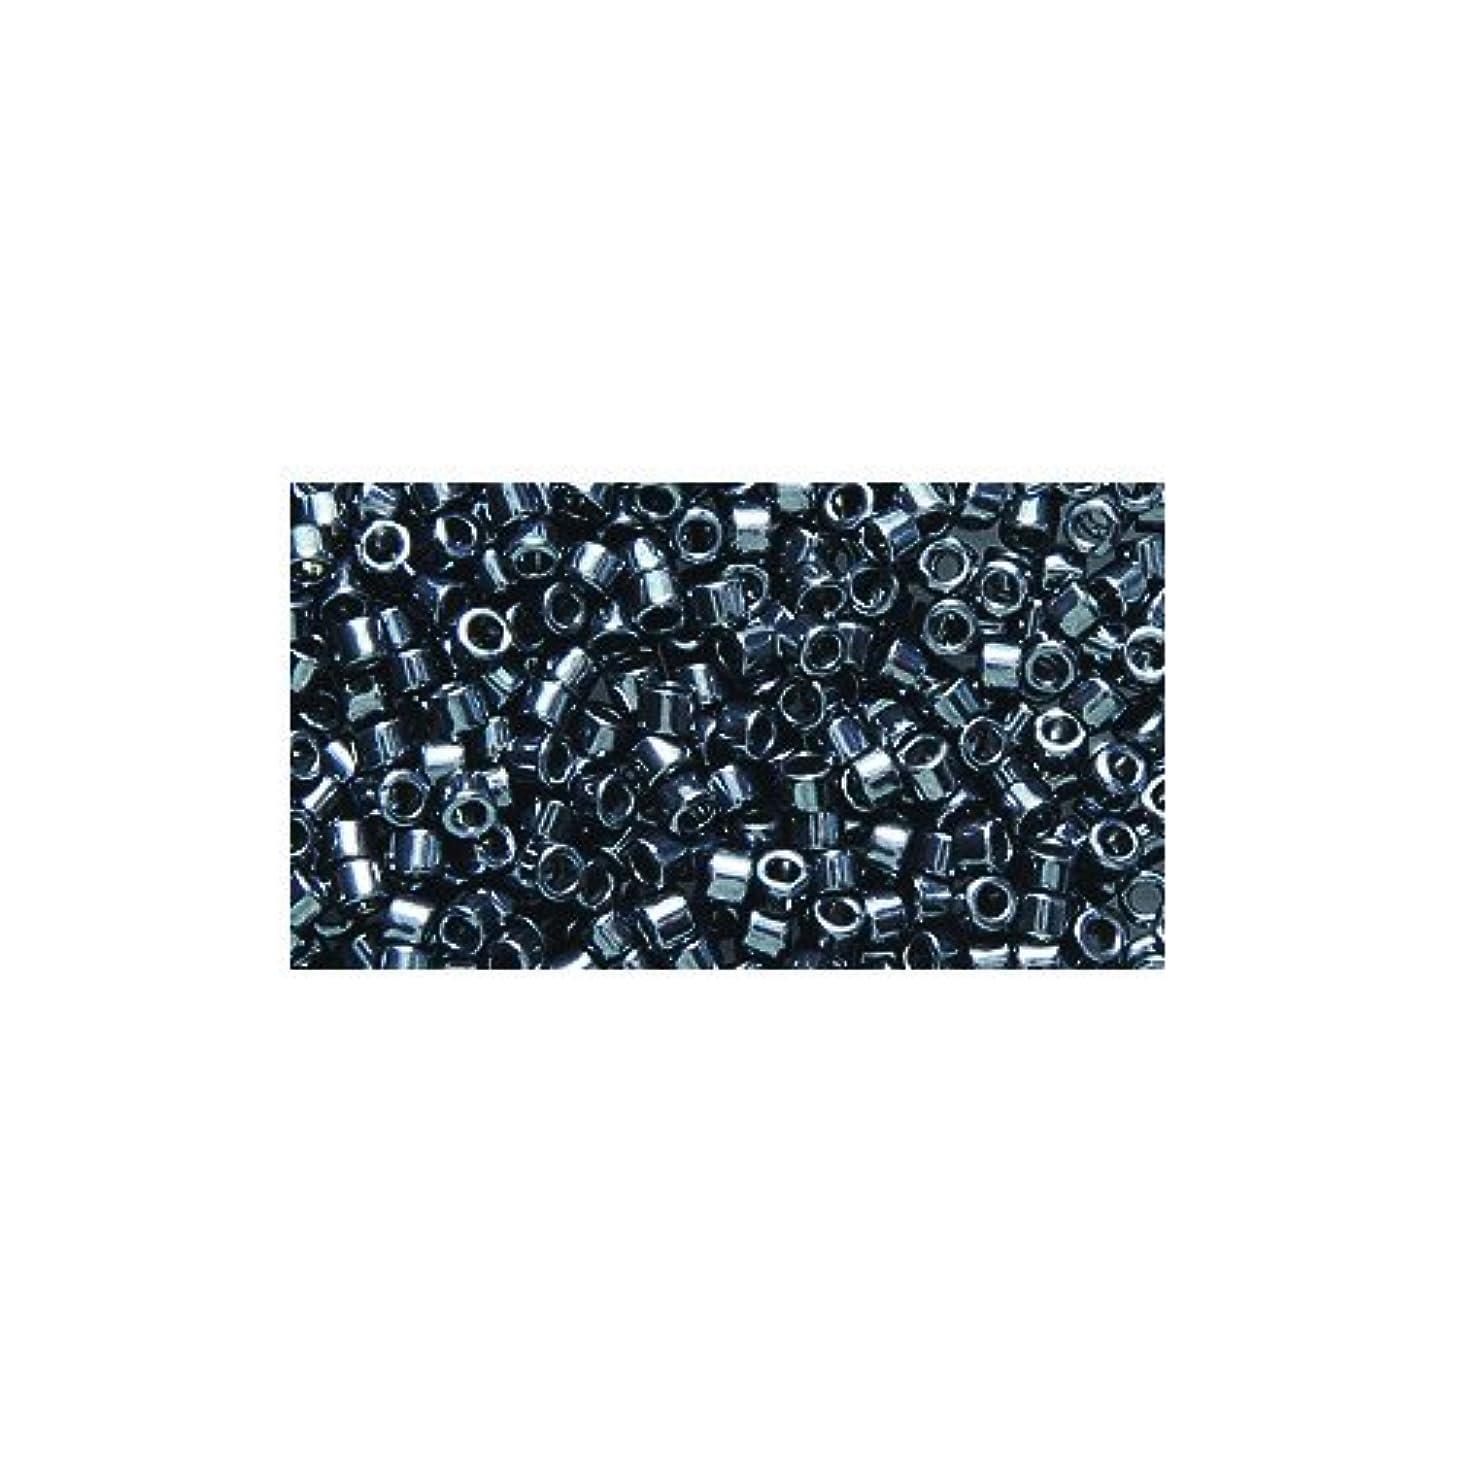 Miyuki Delica Seed Bead 11/0 DB453, Galvanized Dark Gunmetal, 9-Gram/Pack